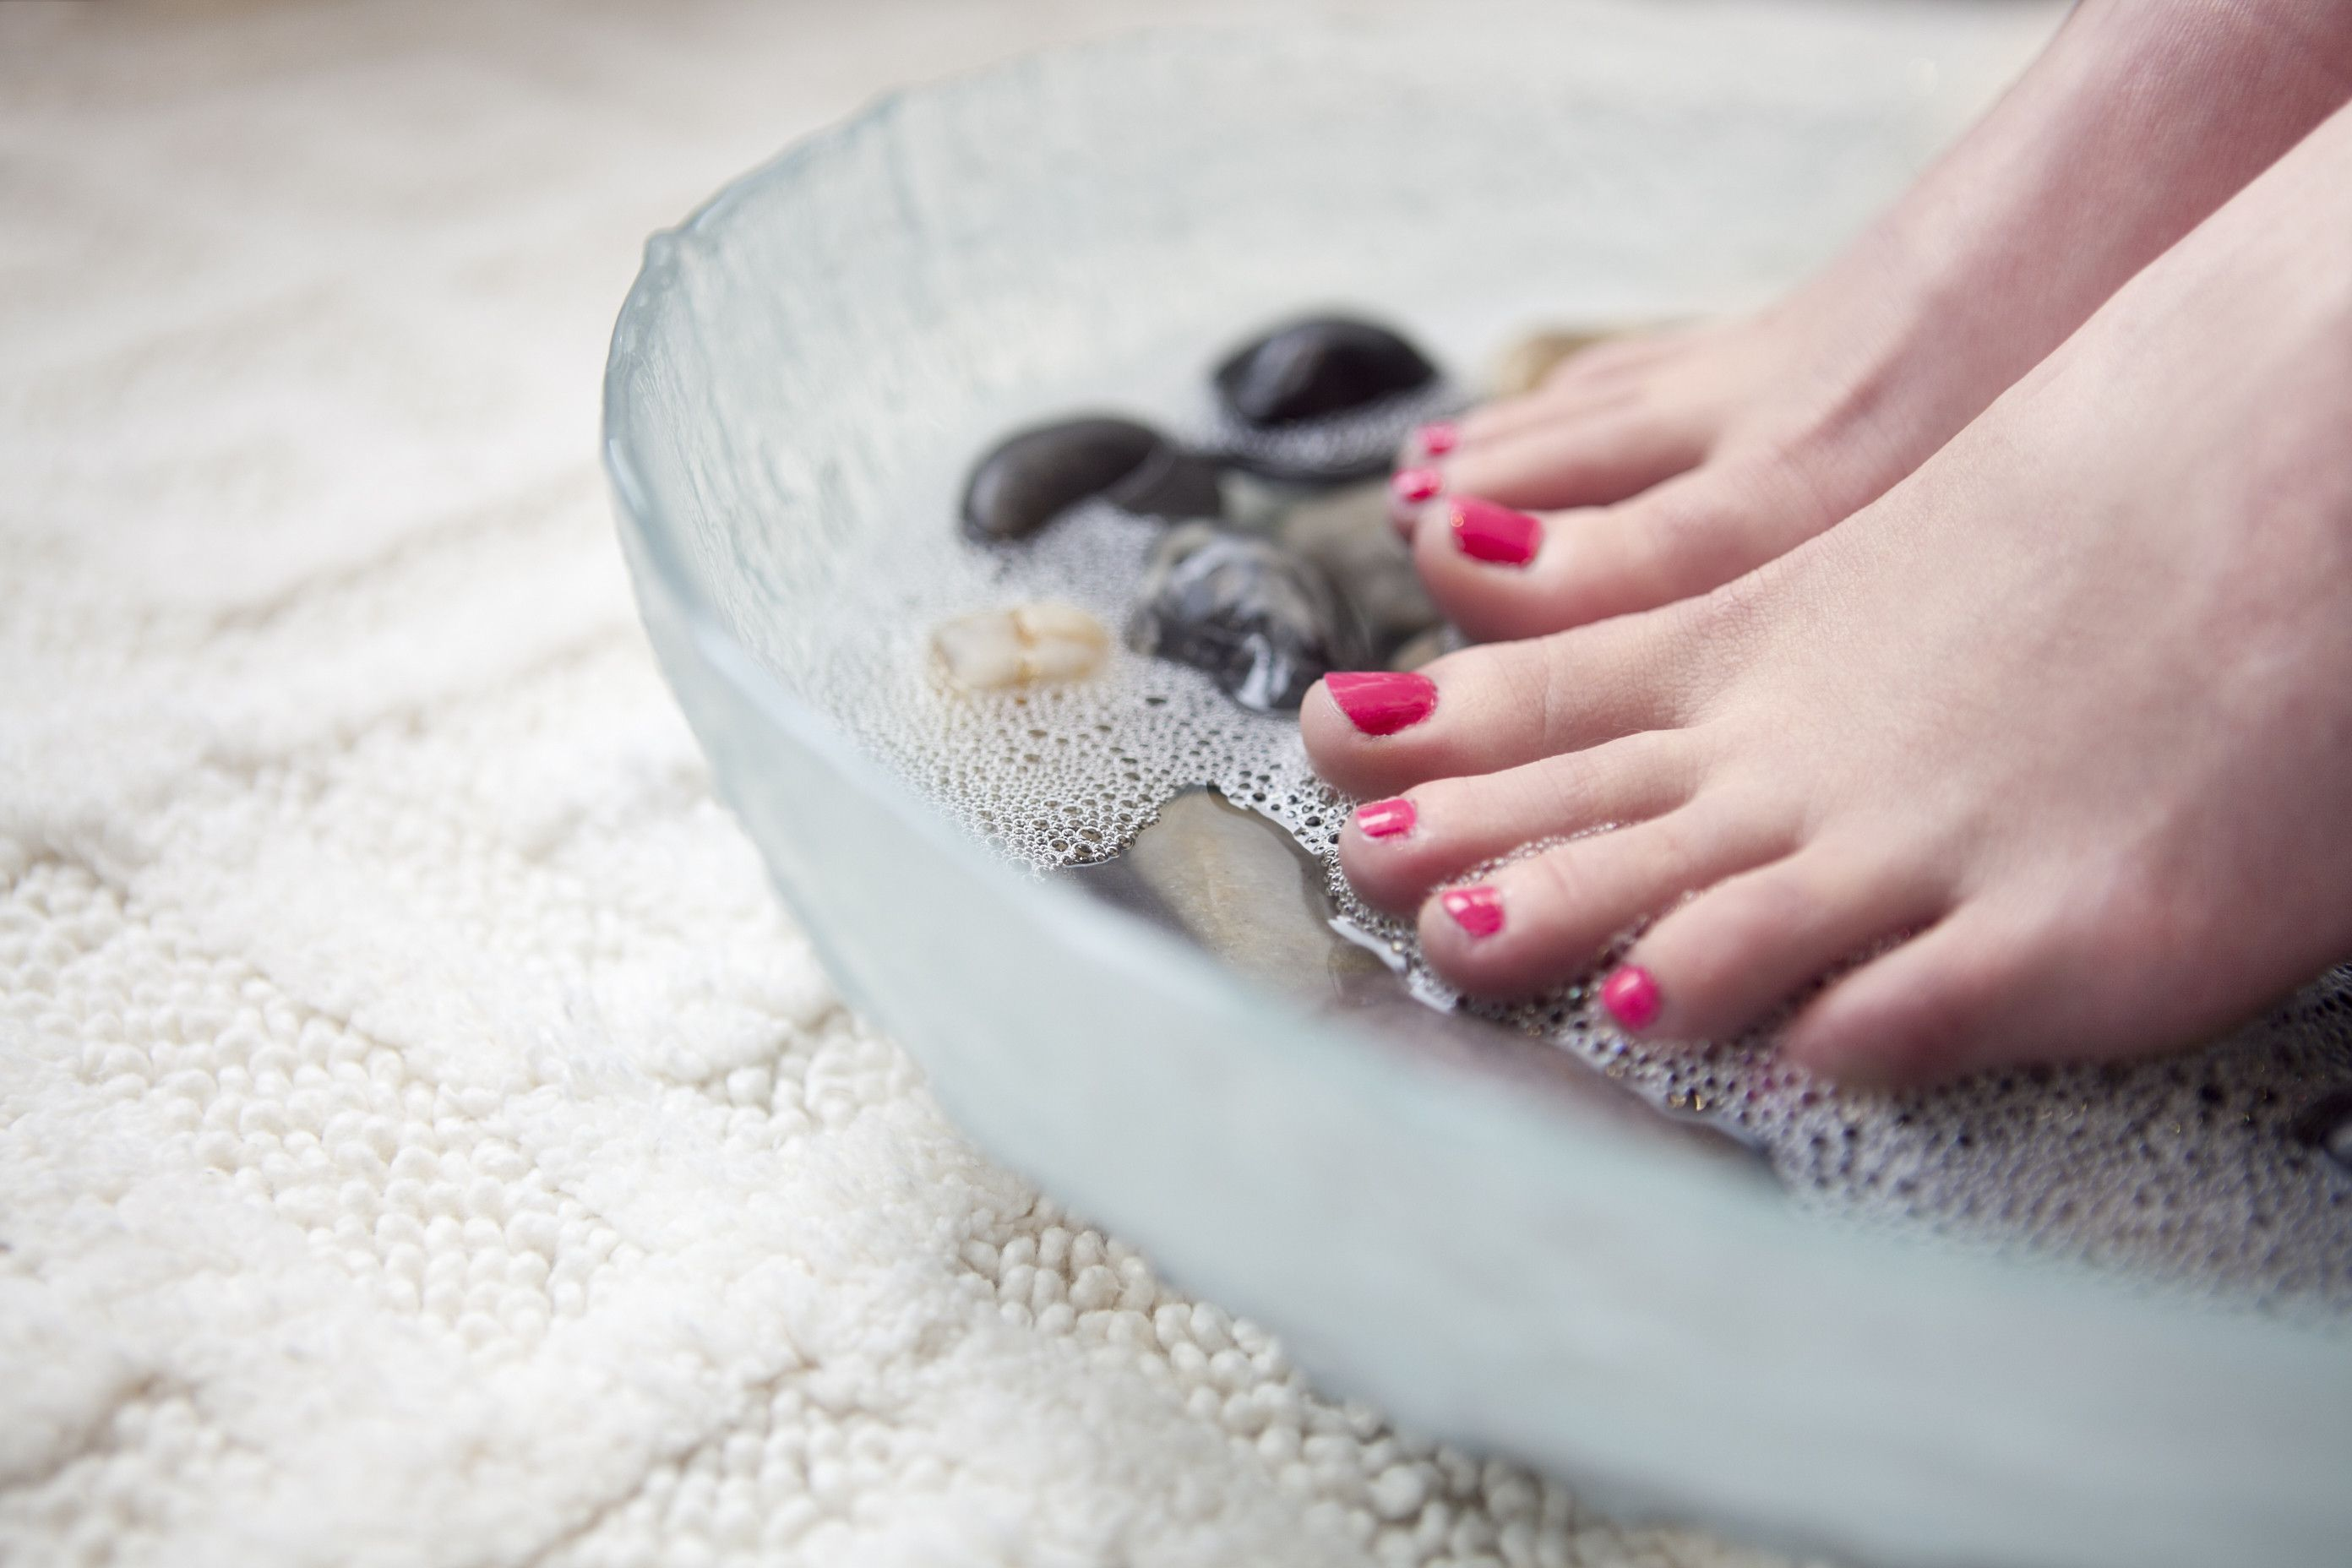 15 For Pedicure With Neck Wrap And Sugar Scrub At Nailz By Amber At 7th Heaven Natural Nail Salon 30 Value Spa Manicure Nail Spa Pedicure